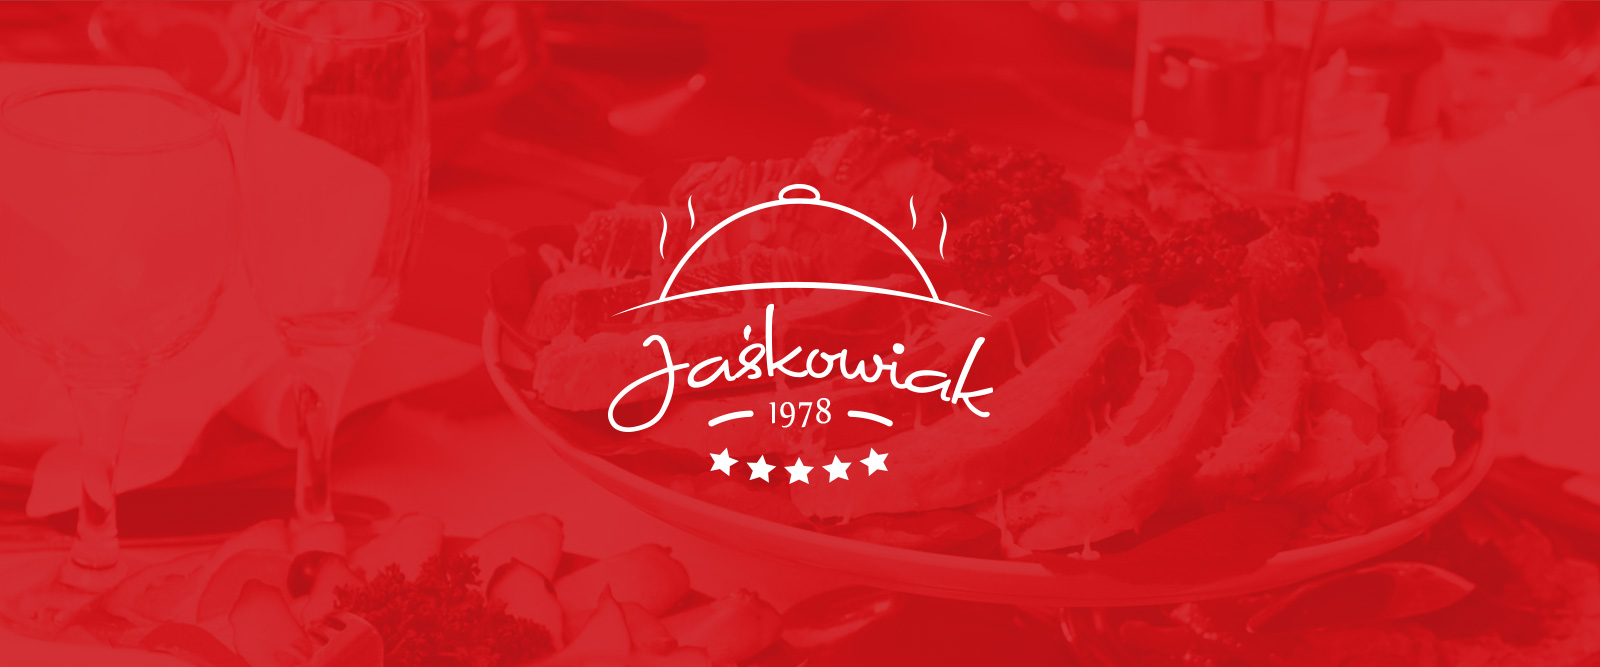 4prezentacja-loga-catering-branding-jaskowiak